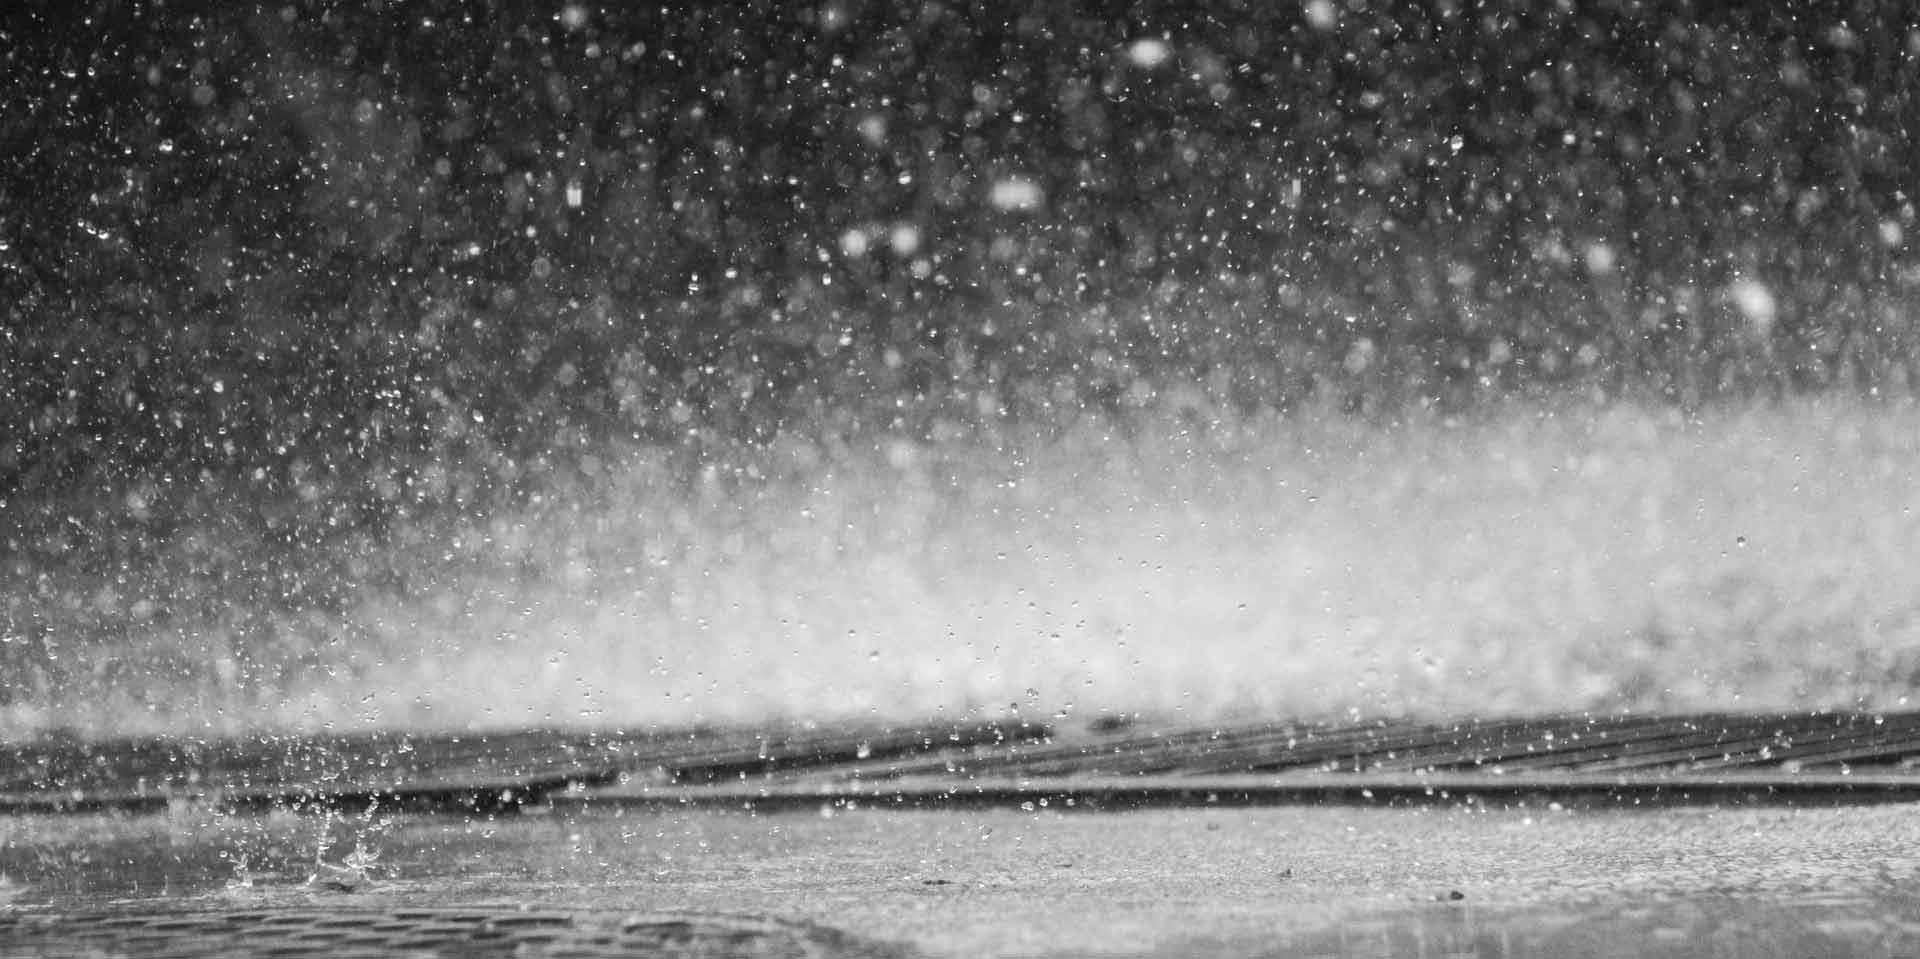 Drift Eliminator Droplets